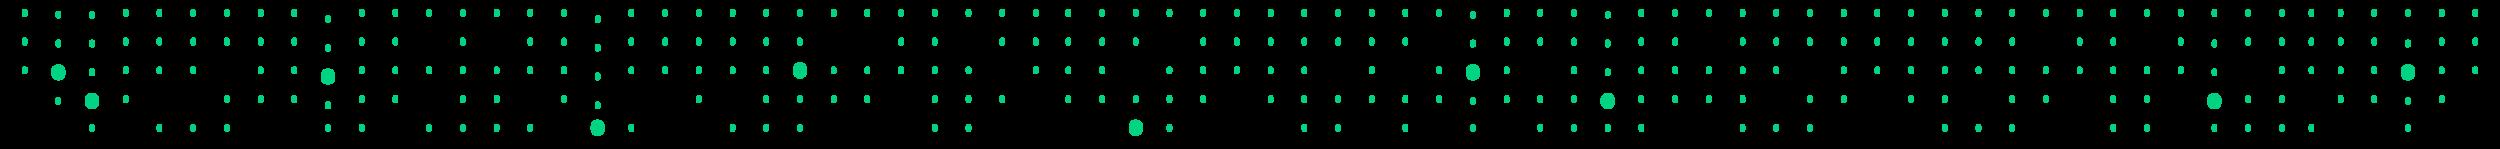 WormCapital_Horizontal_Dot_Strip_Green.png